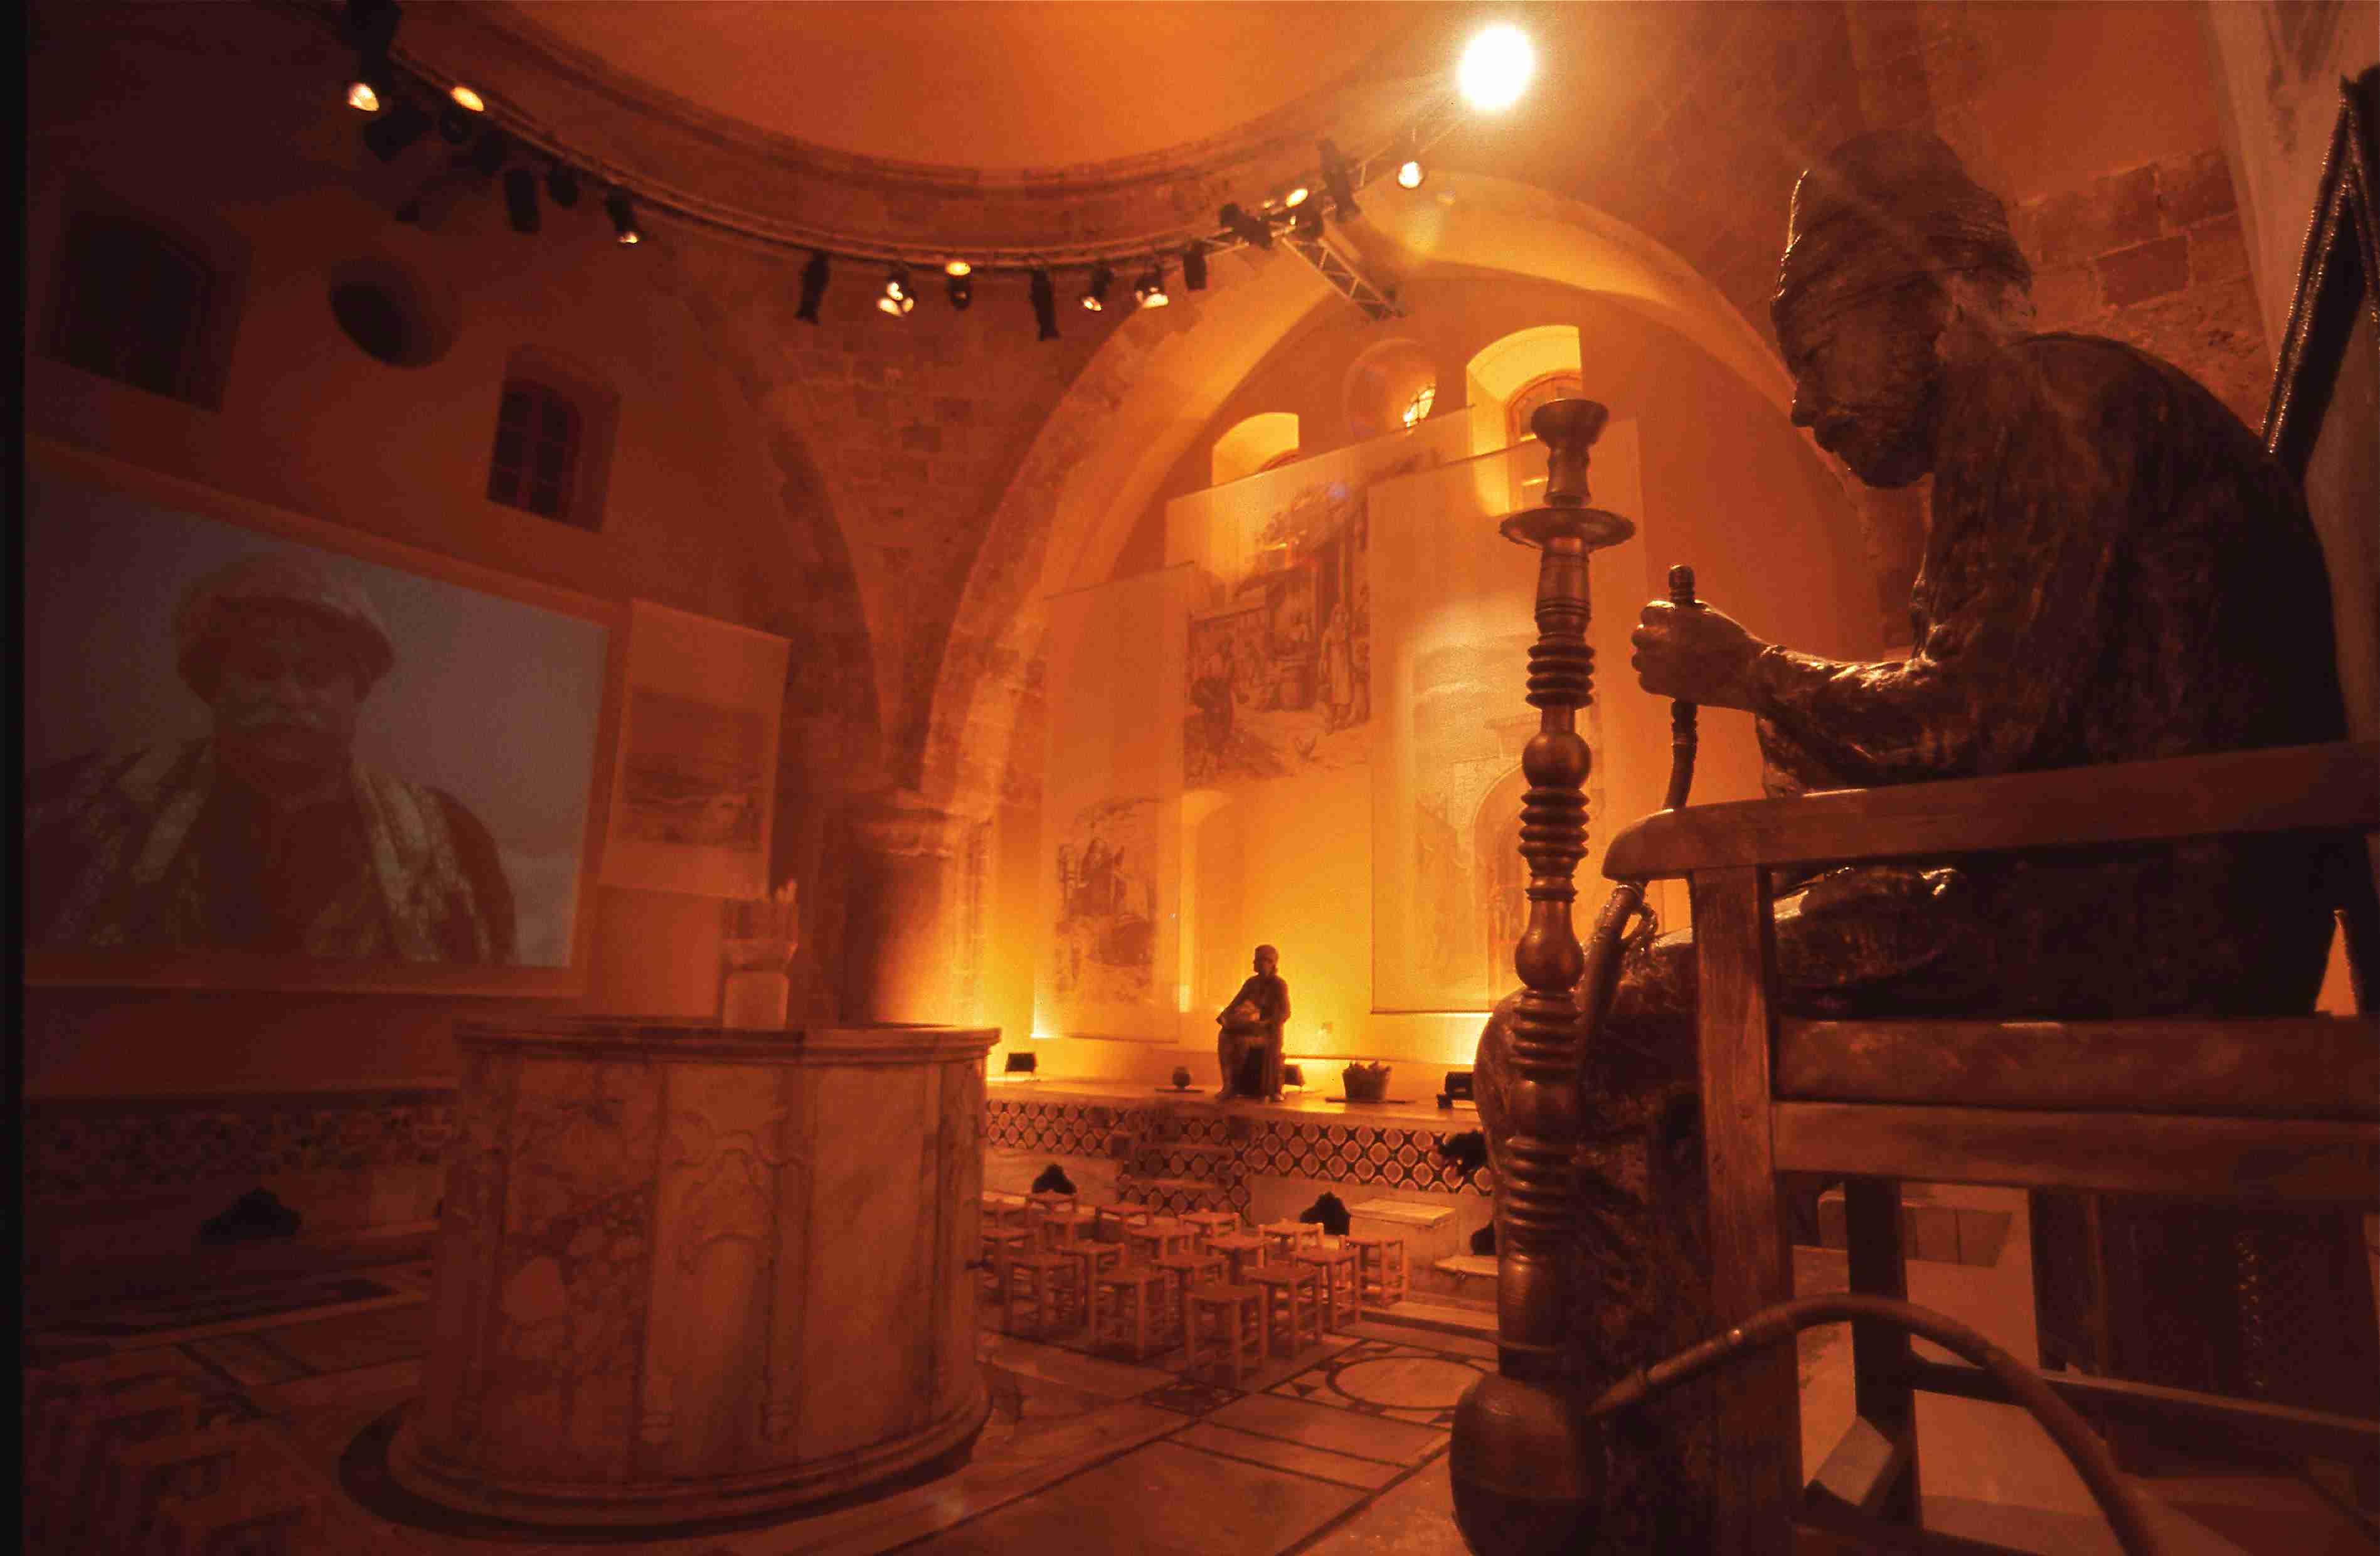 Akko-Acre-Hammam-al-Pasha-Turkish-Baths-Israel-Tourism.jpg